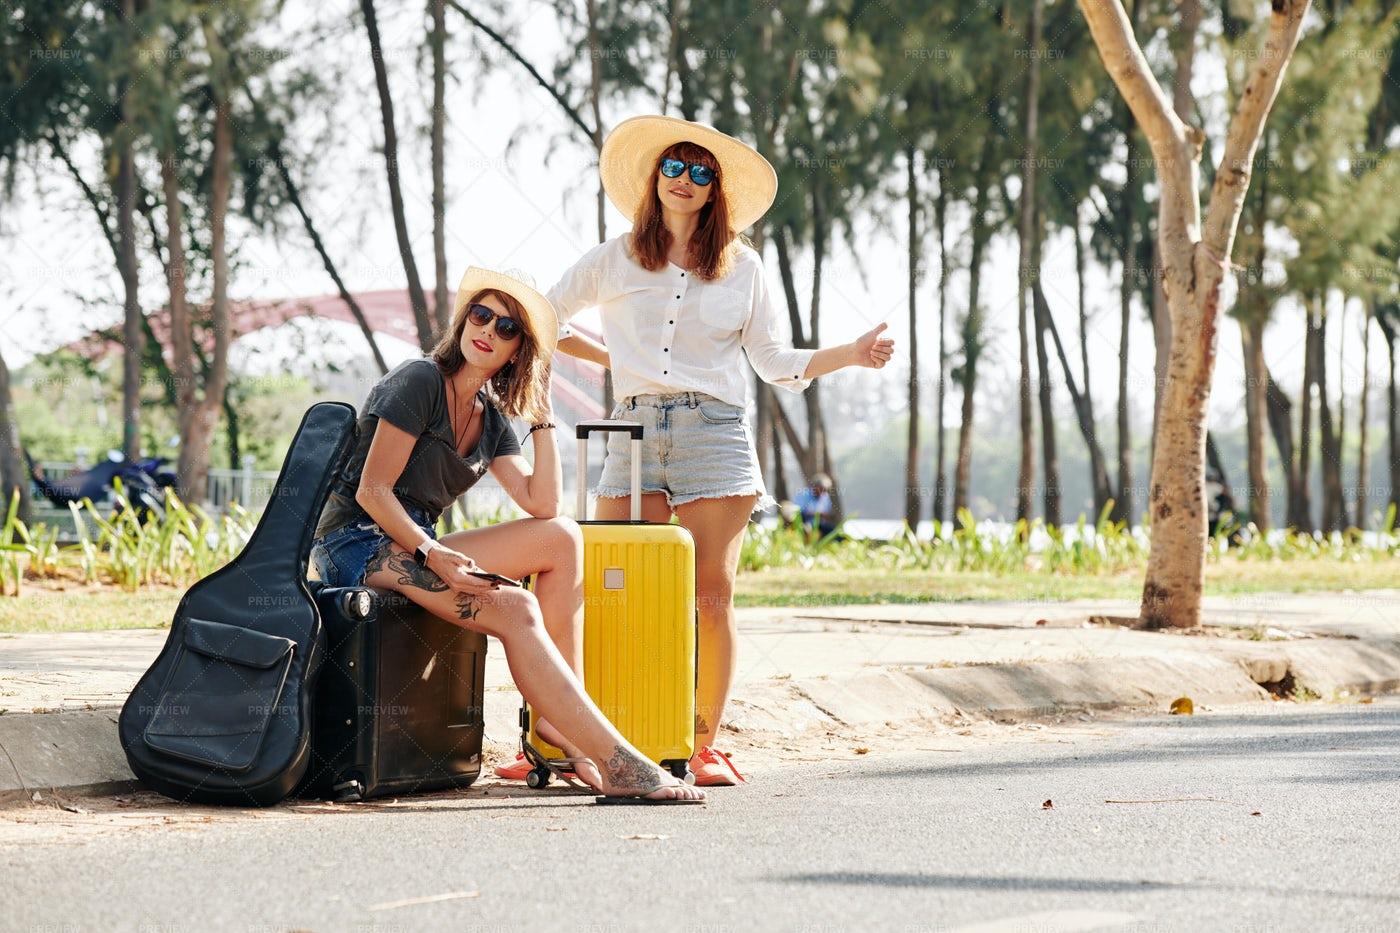 Hitchhikers Catching Car: Stock Photos